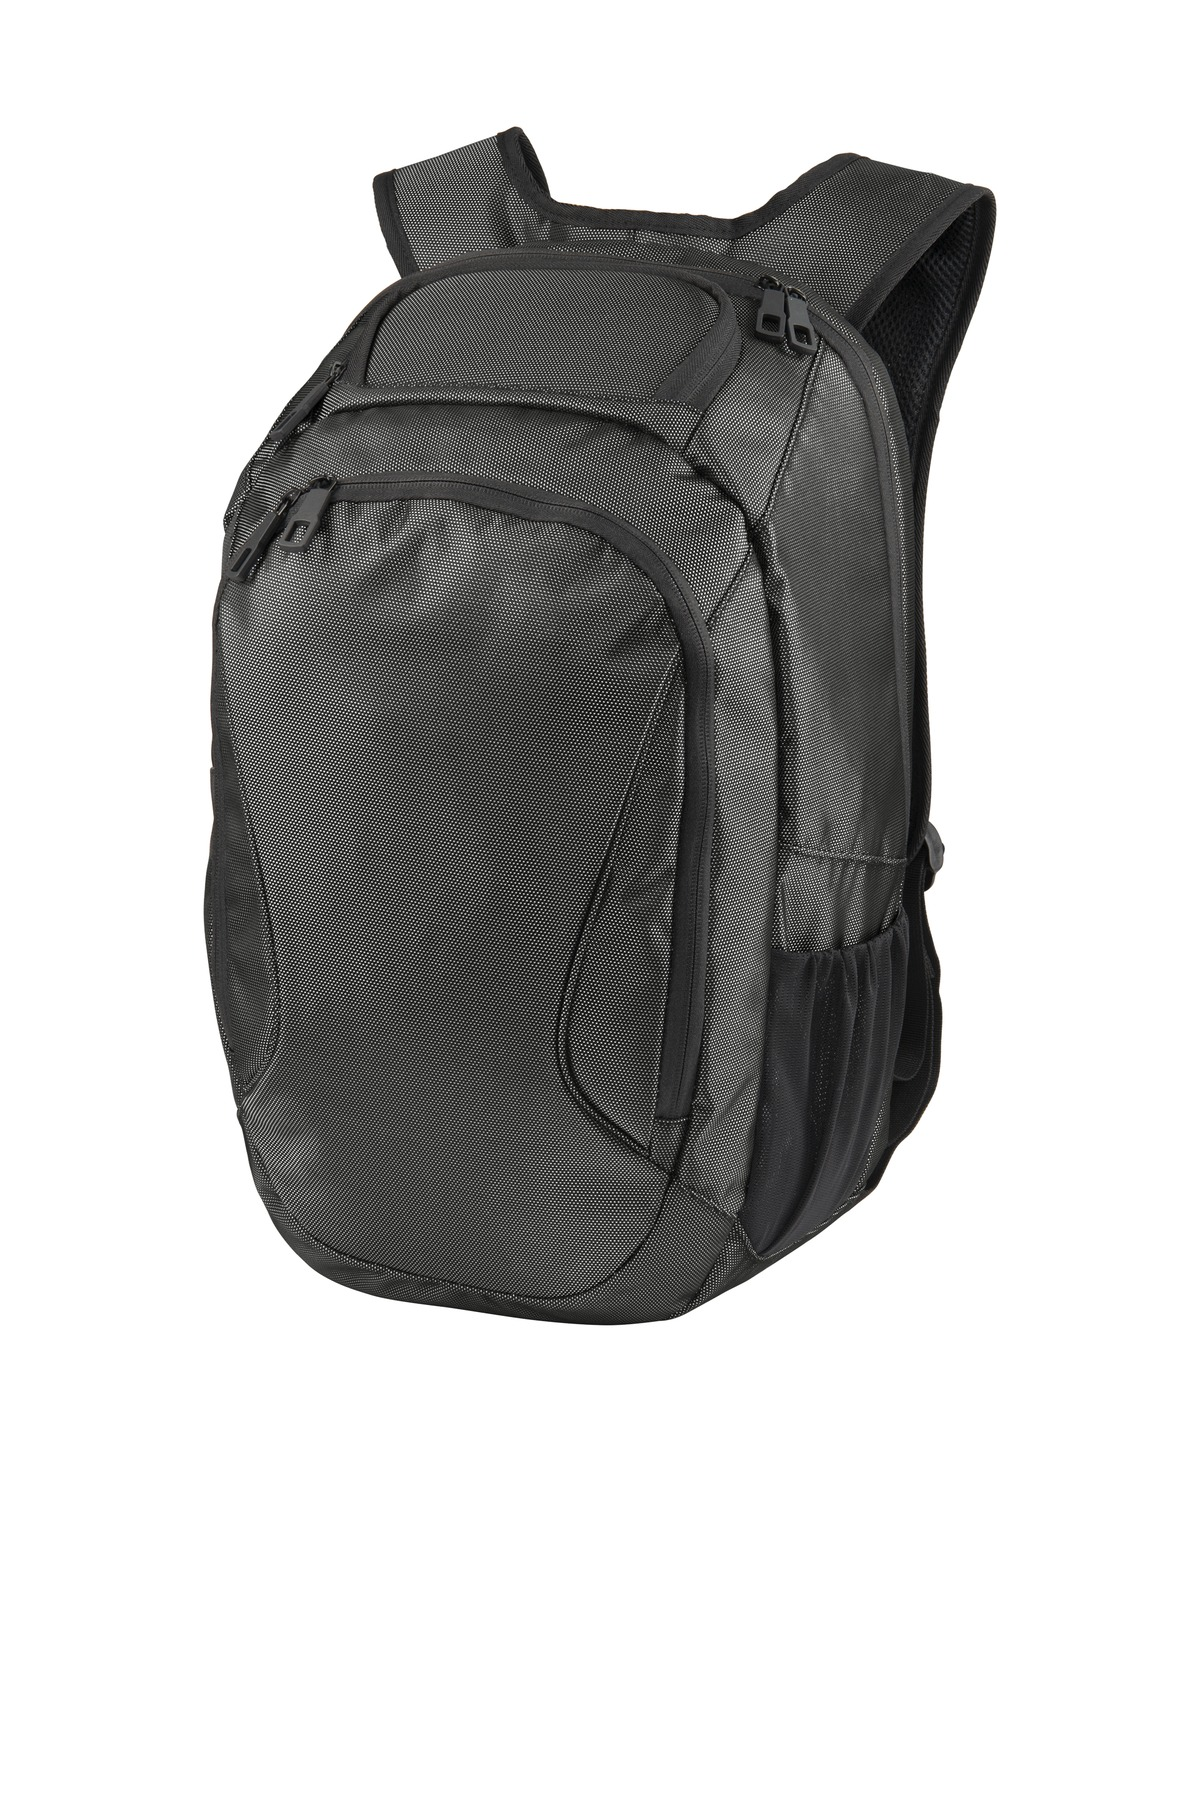 Port Authority  Form Backpack. BG212